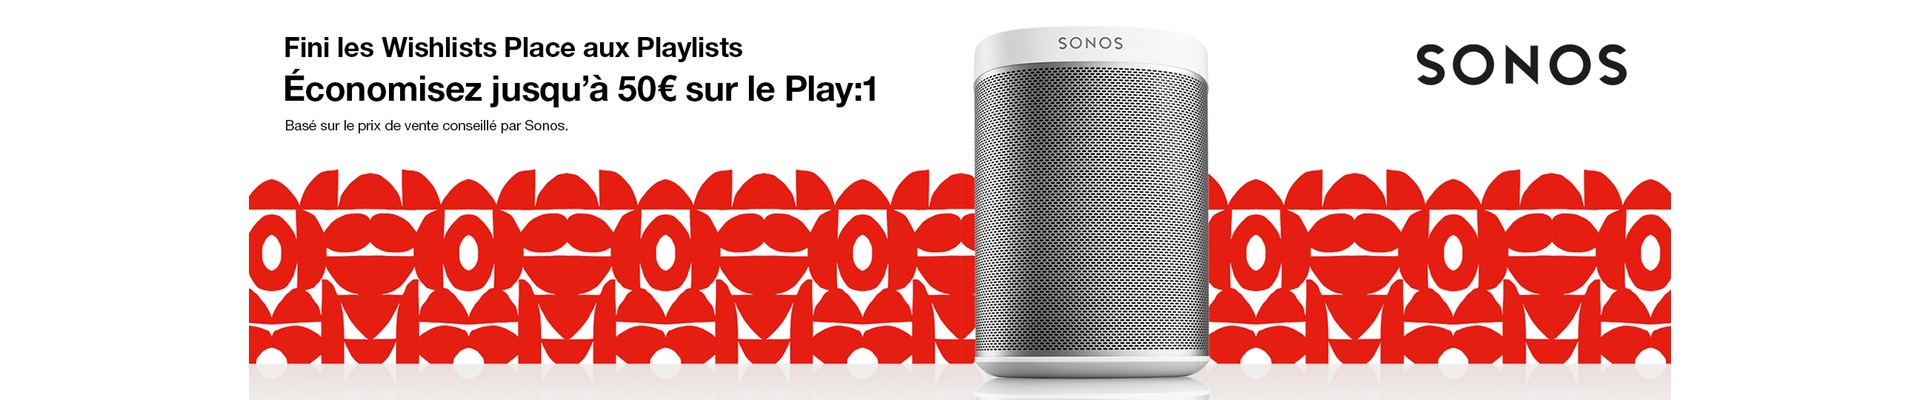 odr-multizone-2017-sonos-play1